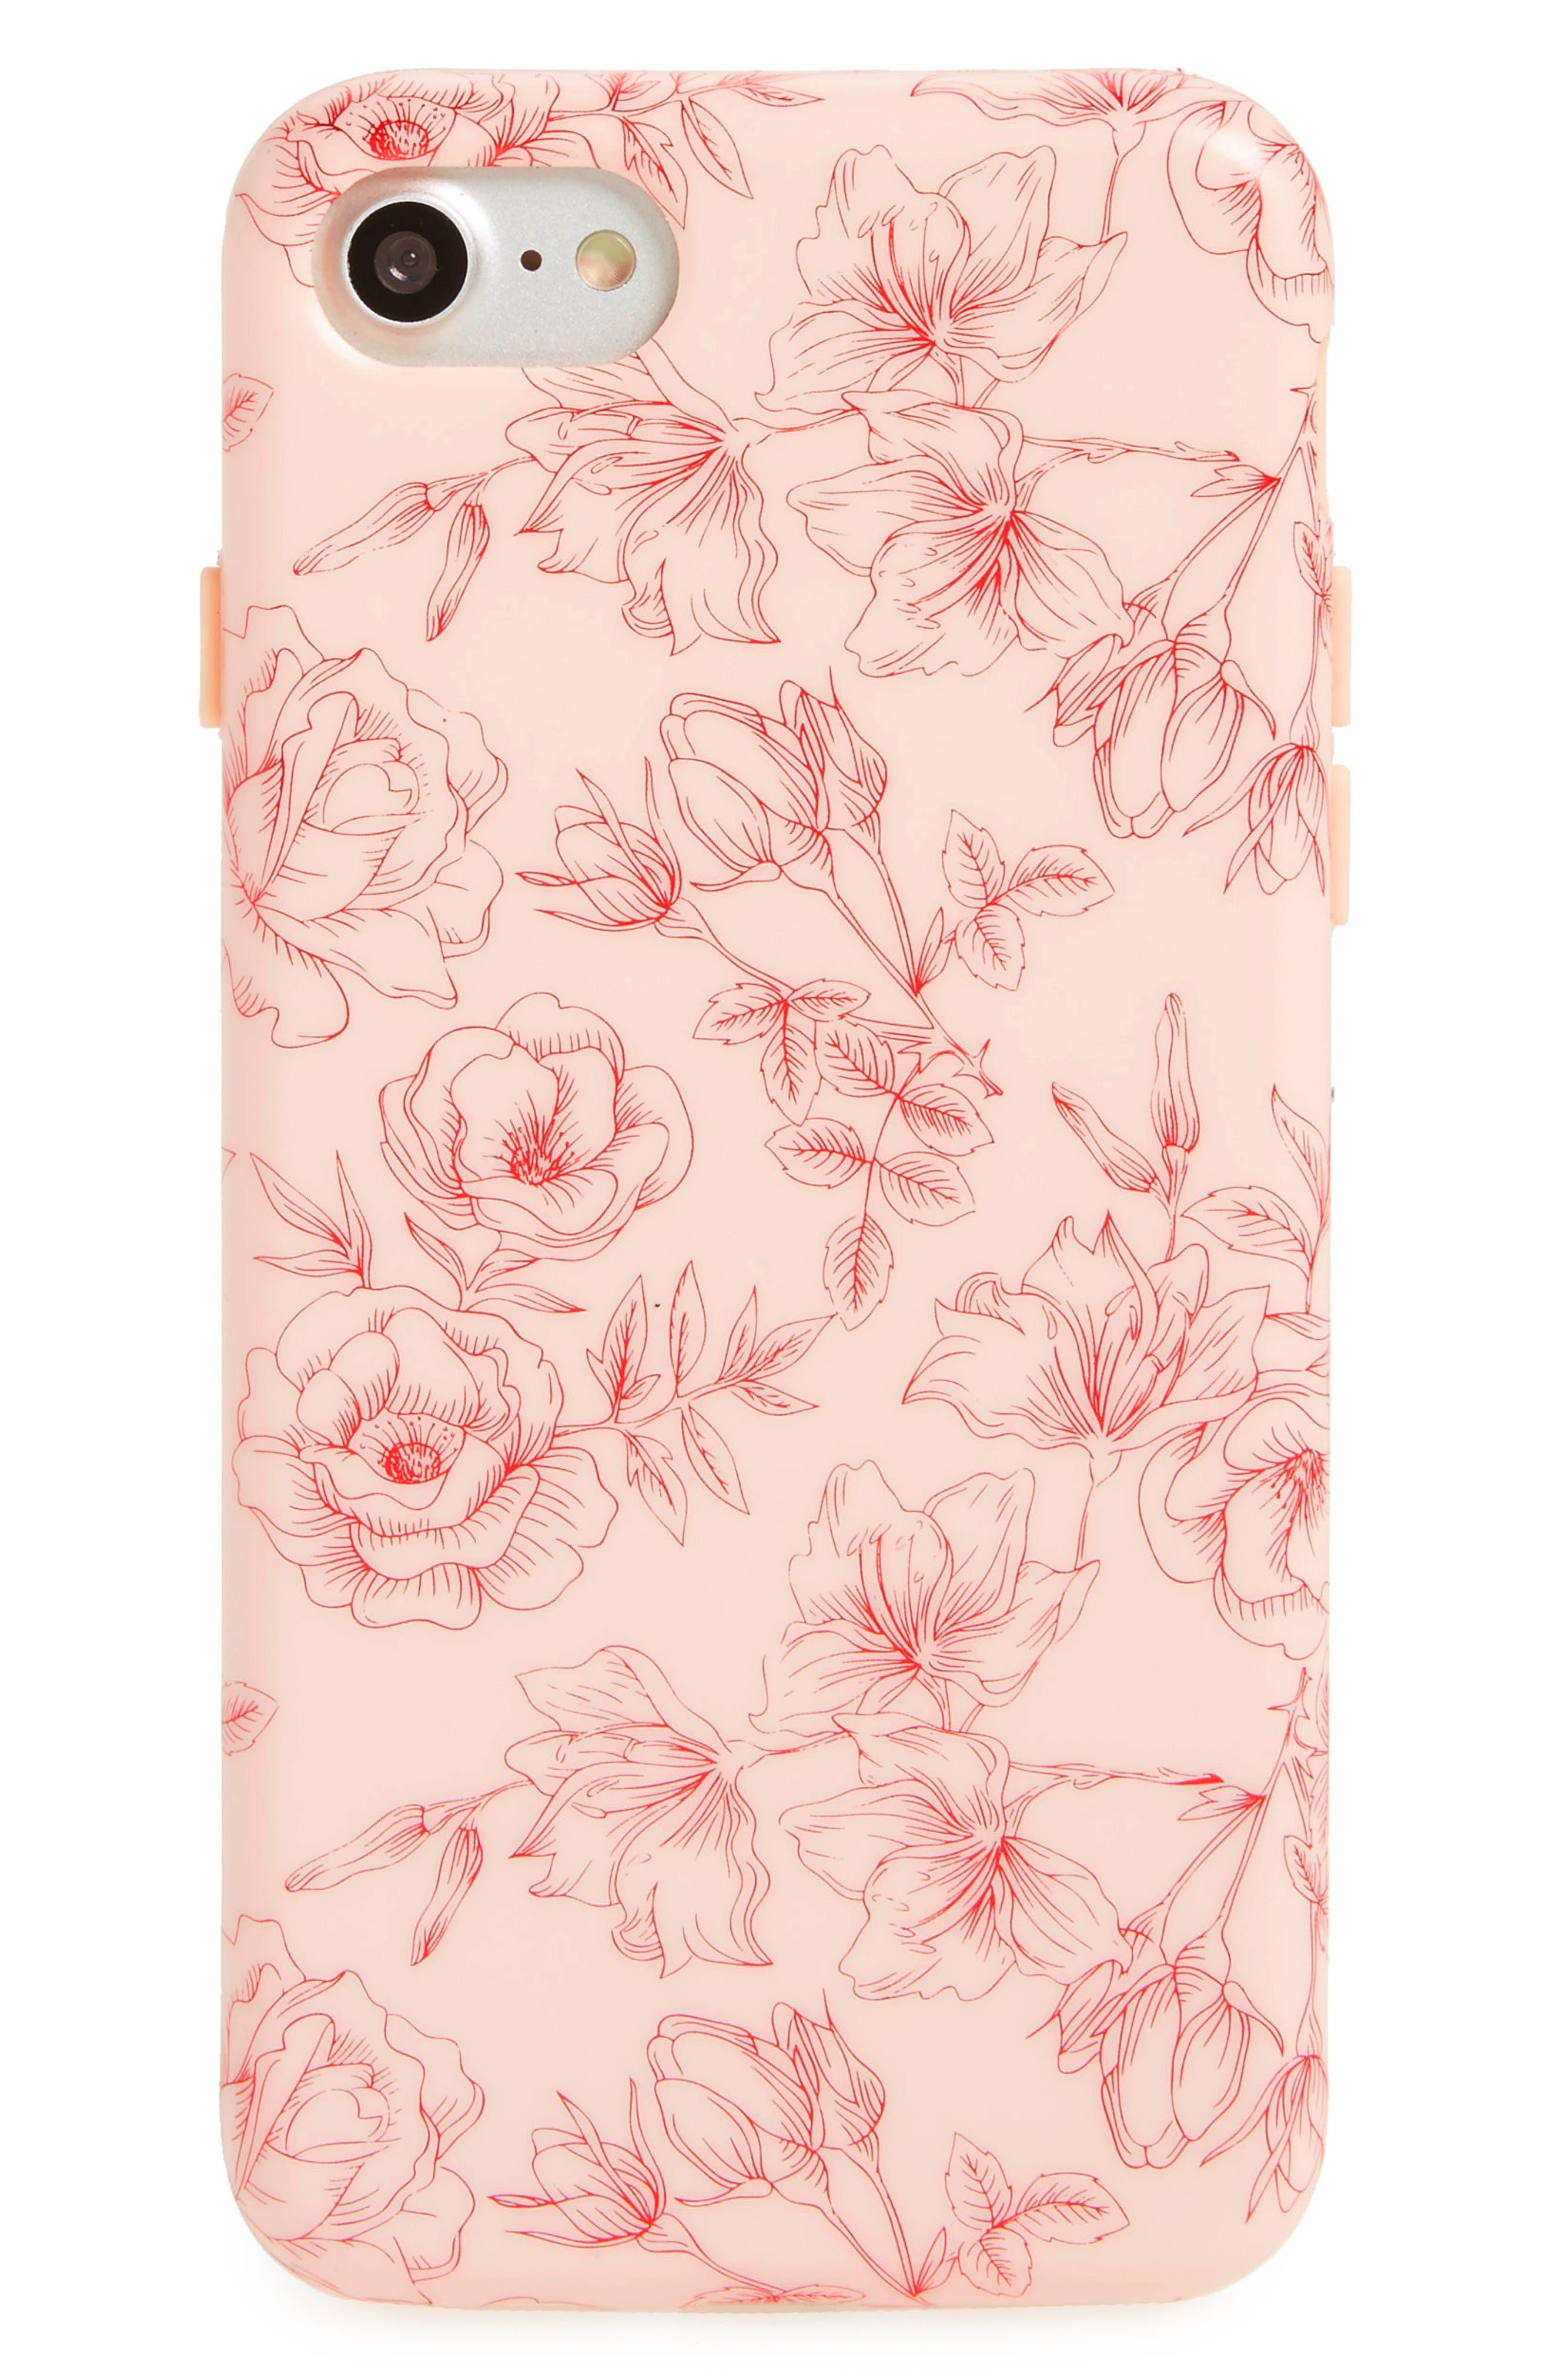 Floral Chrome iPhone 7/8 Case,                         Main,                         color, Pink